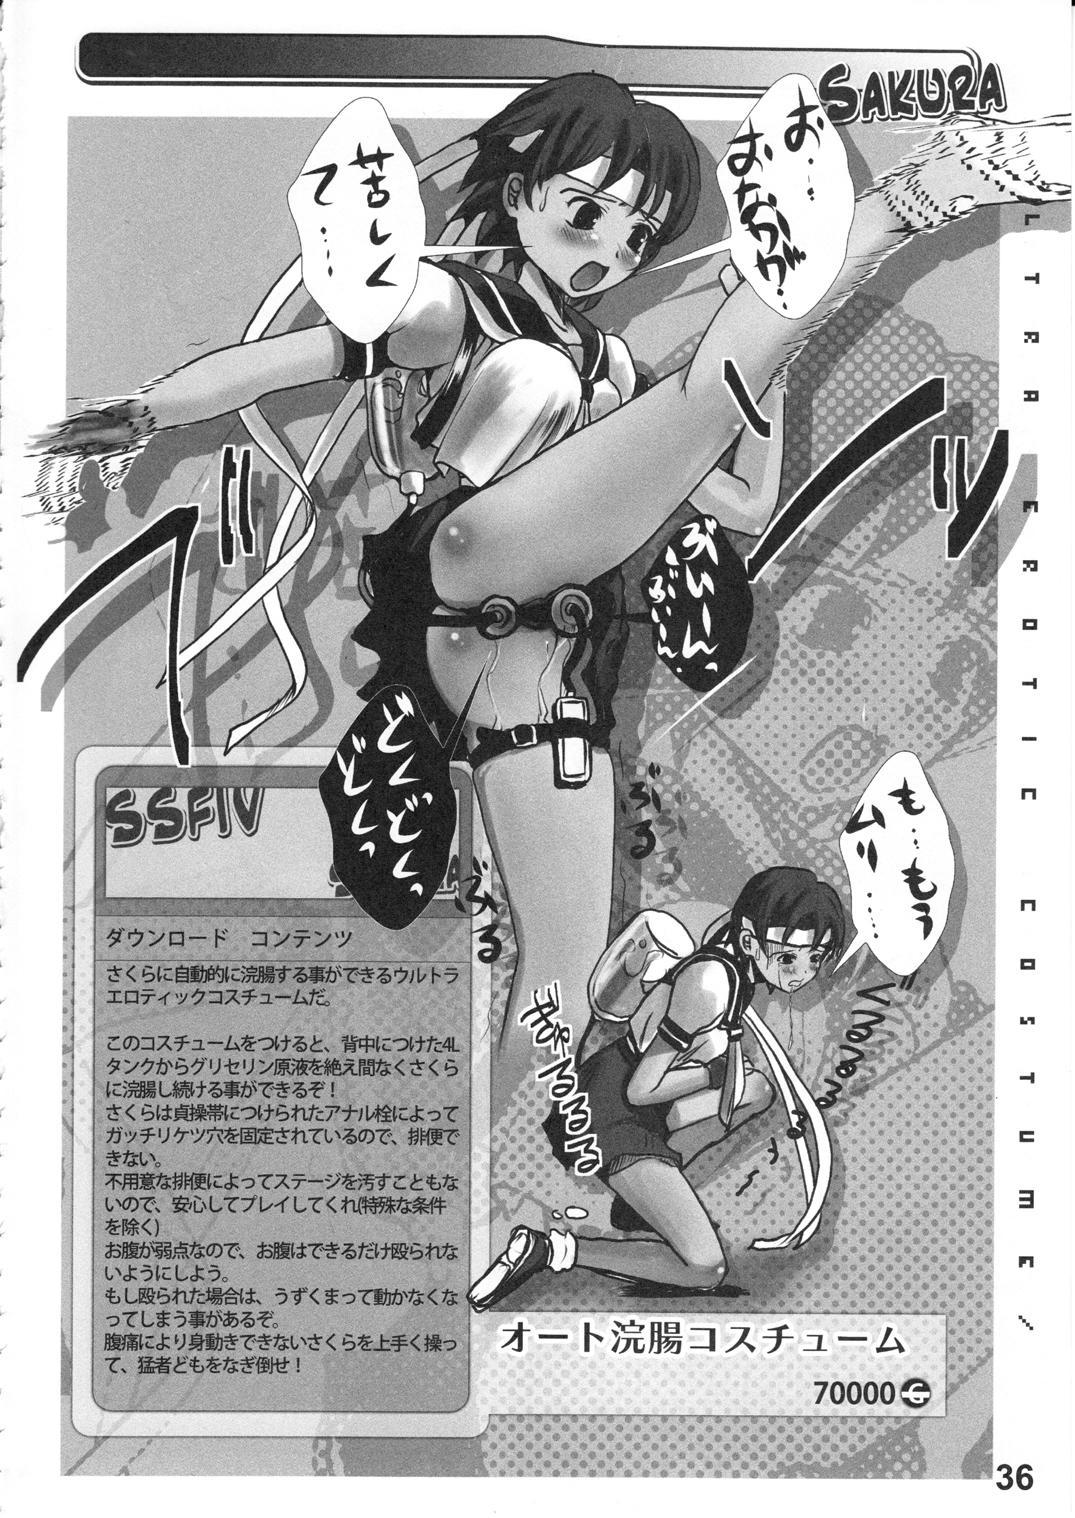 EroCos! - Ultra Erotic Fantasy Costume 37